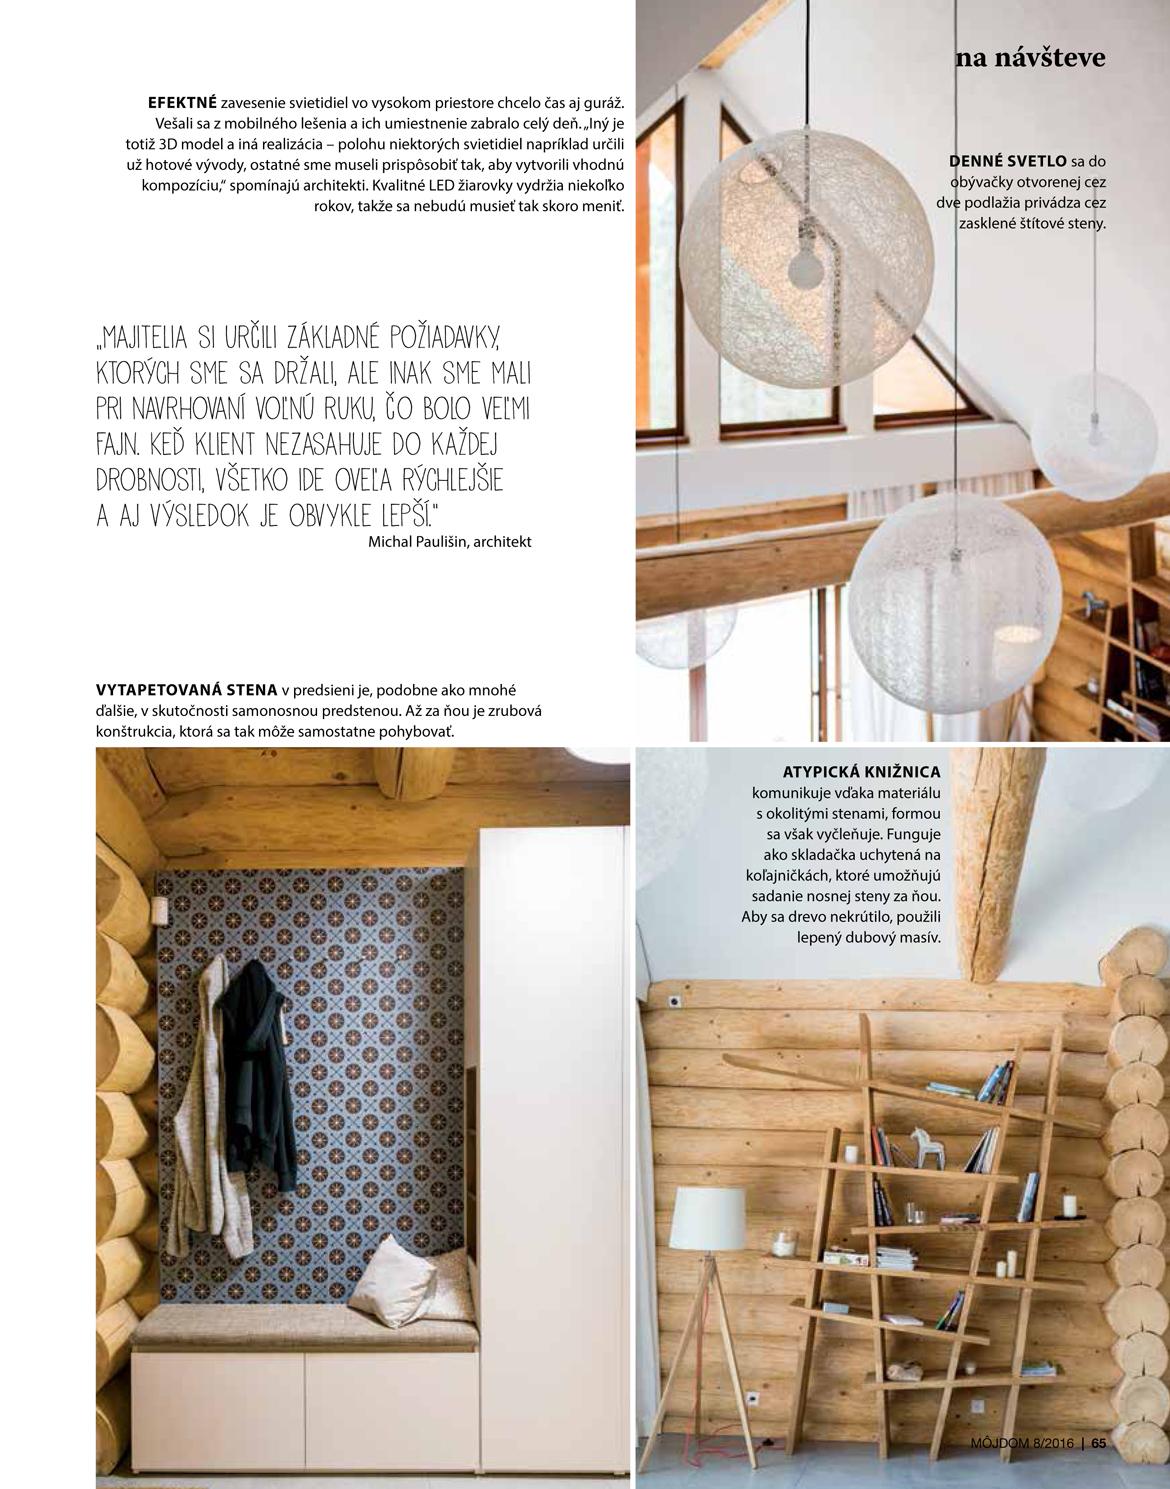 010-interier-zrub-tale-mojdom-pavlech-architekti